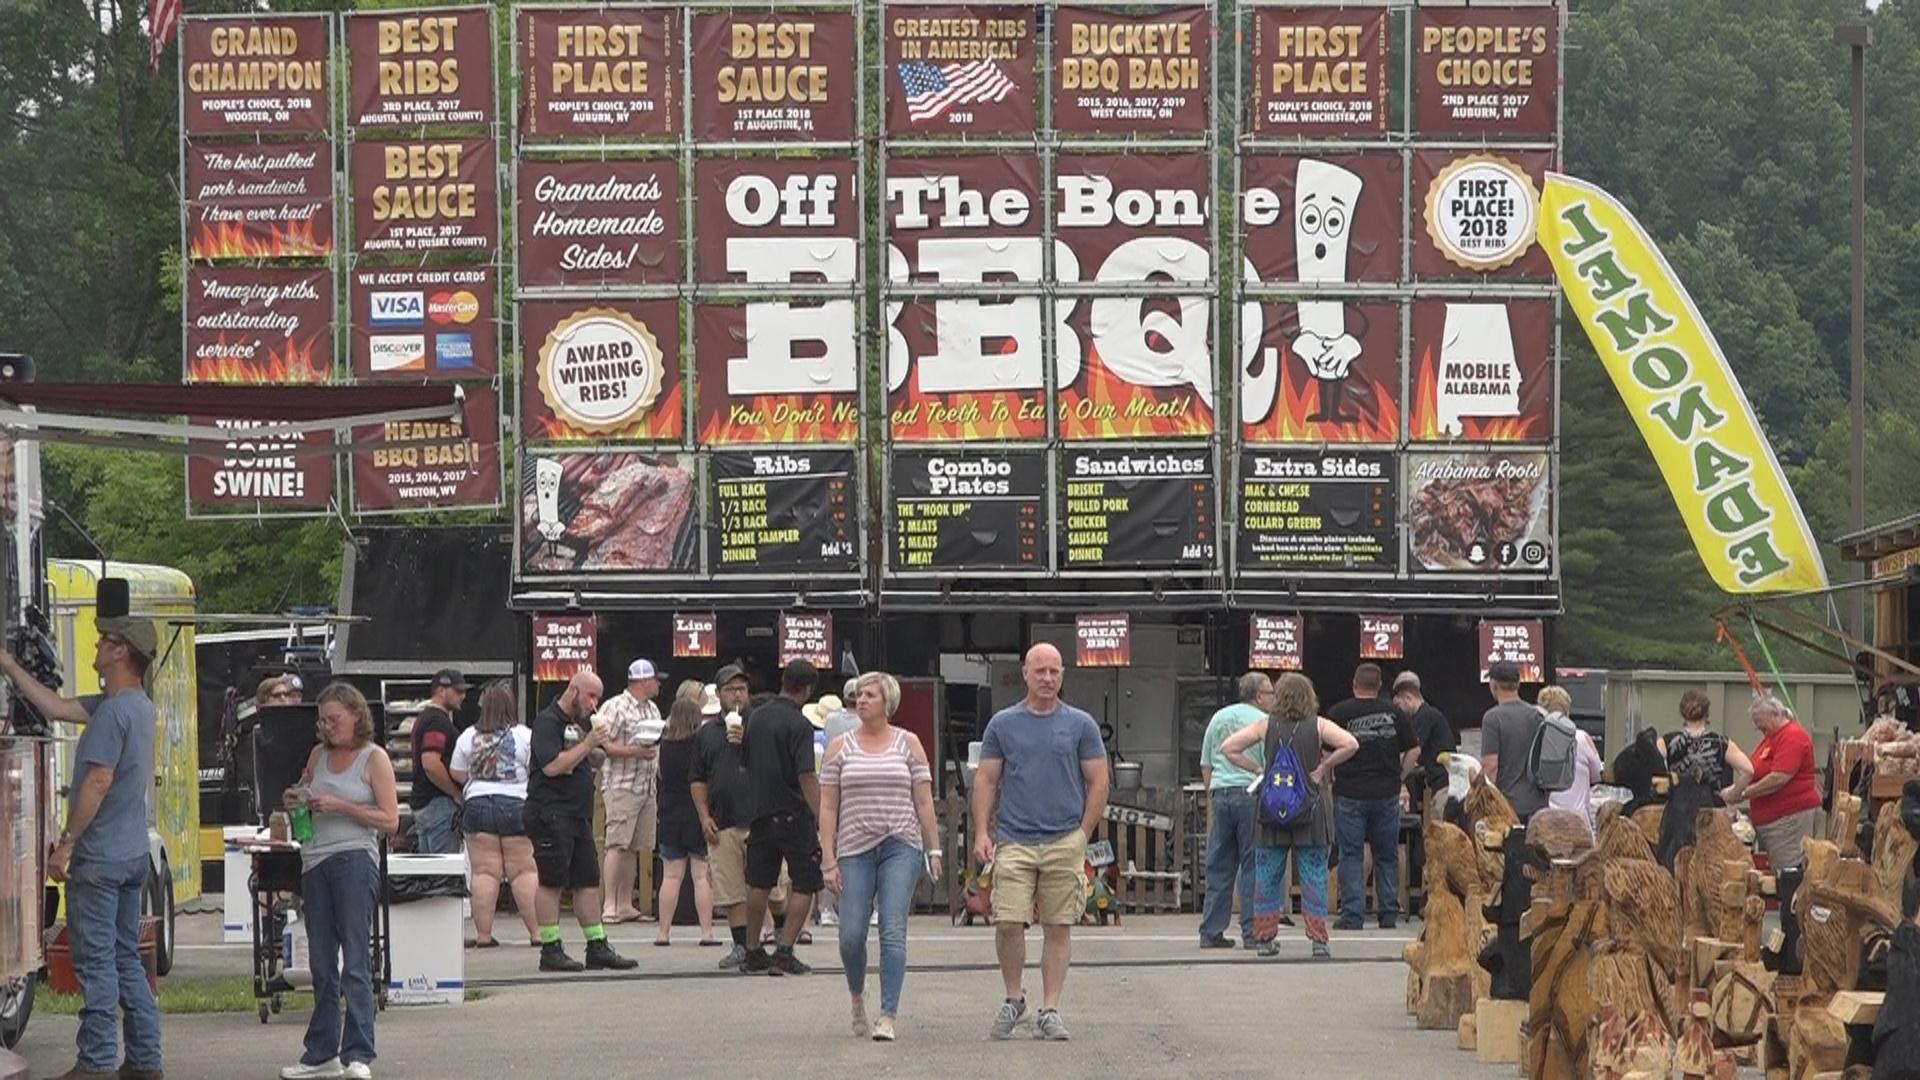 ALMOST HEAVEN BBQ BASH_1559955830514.jpg.jpg